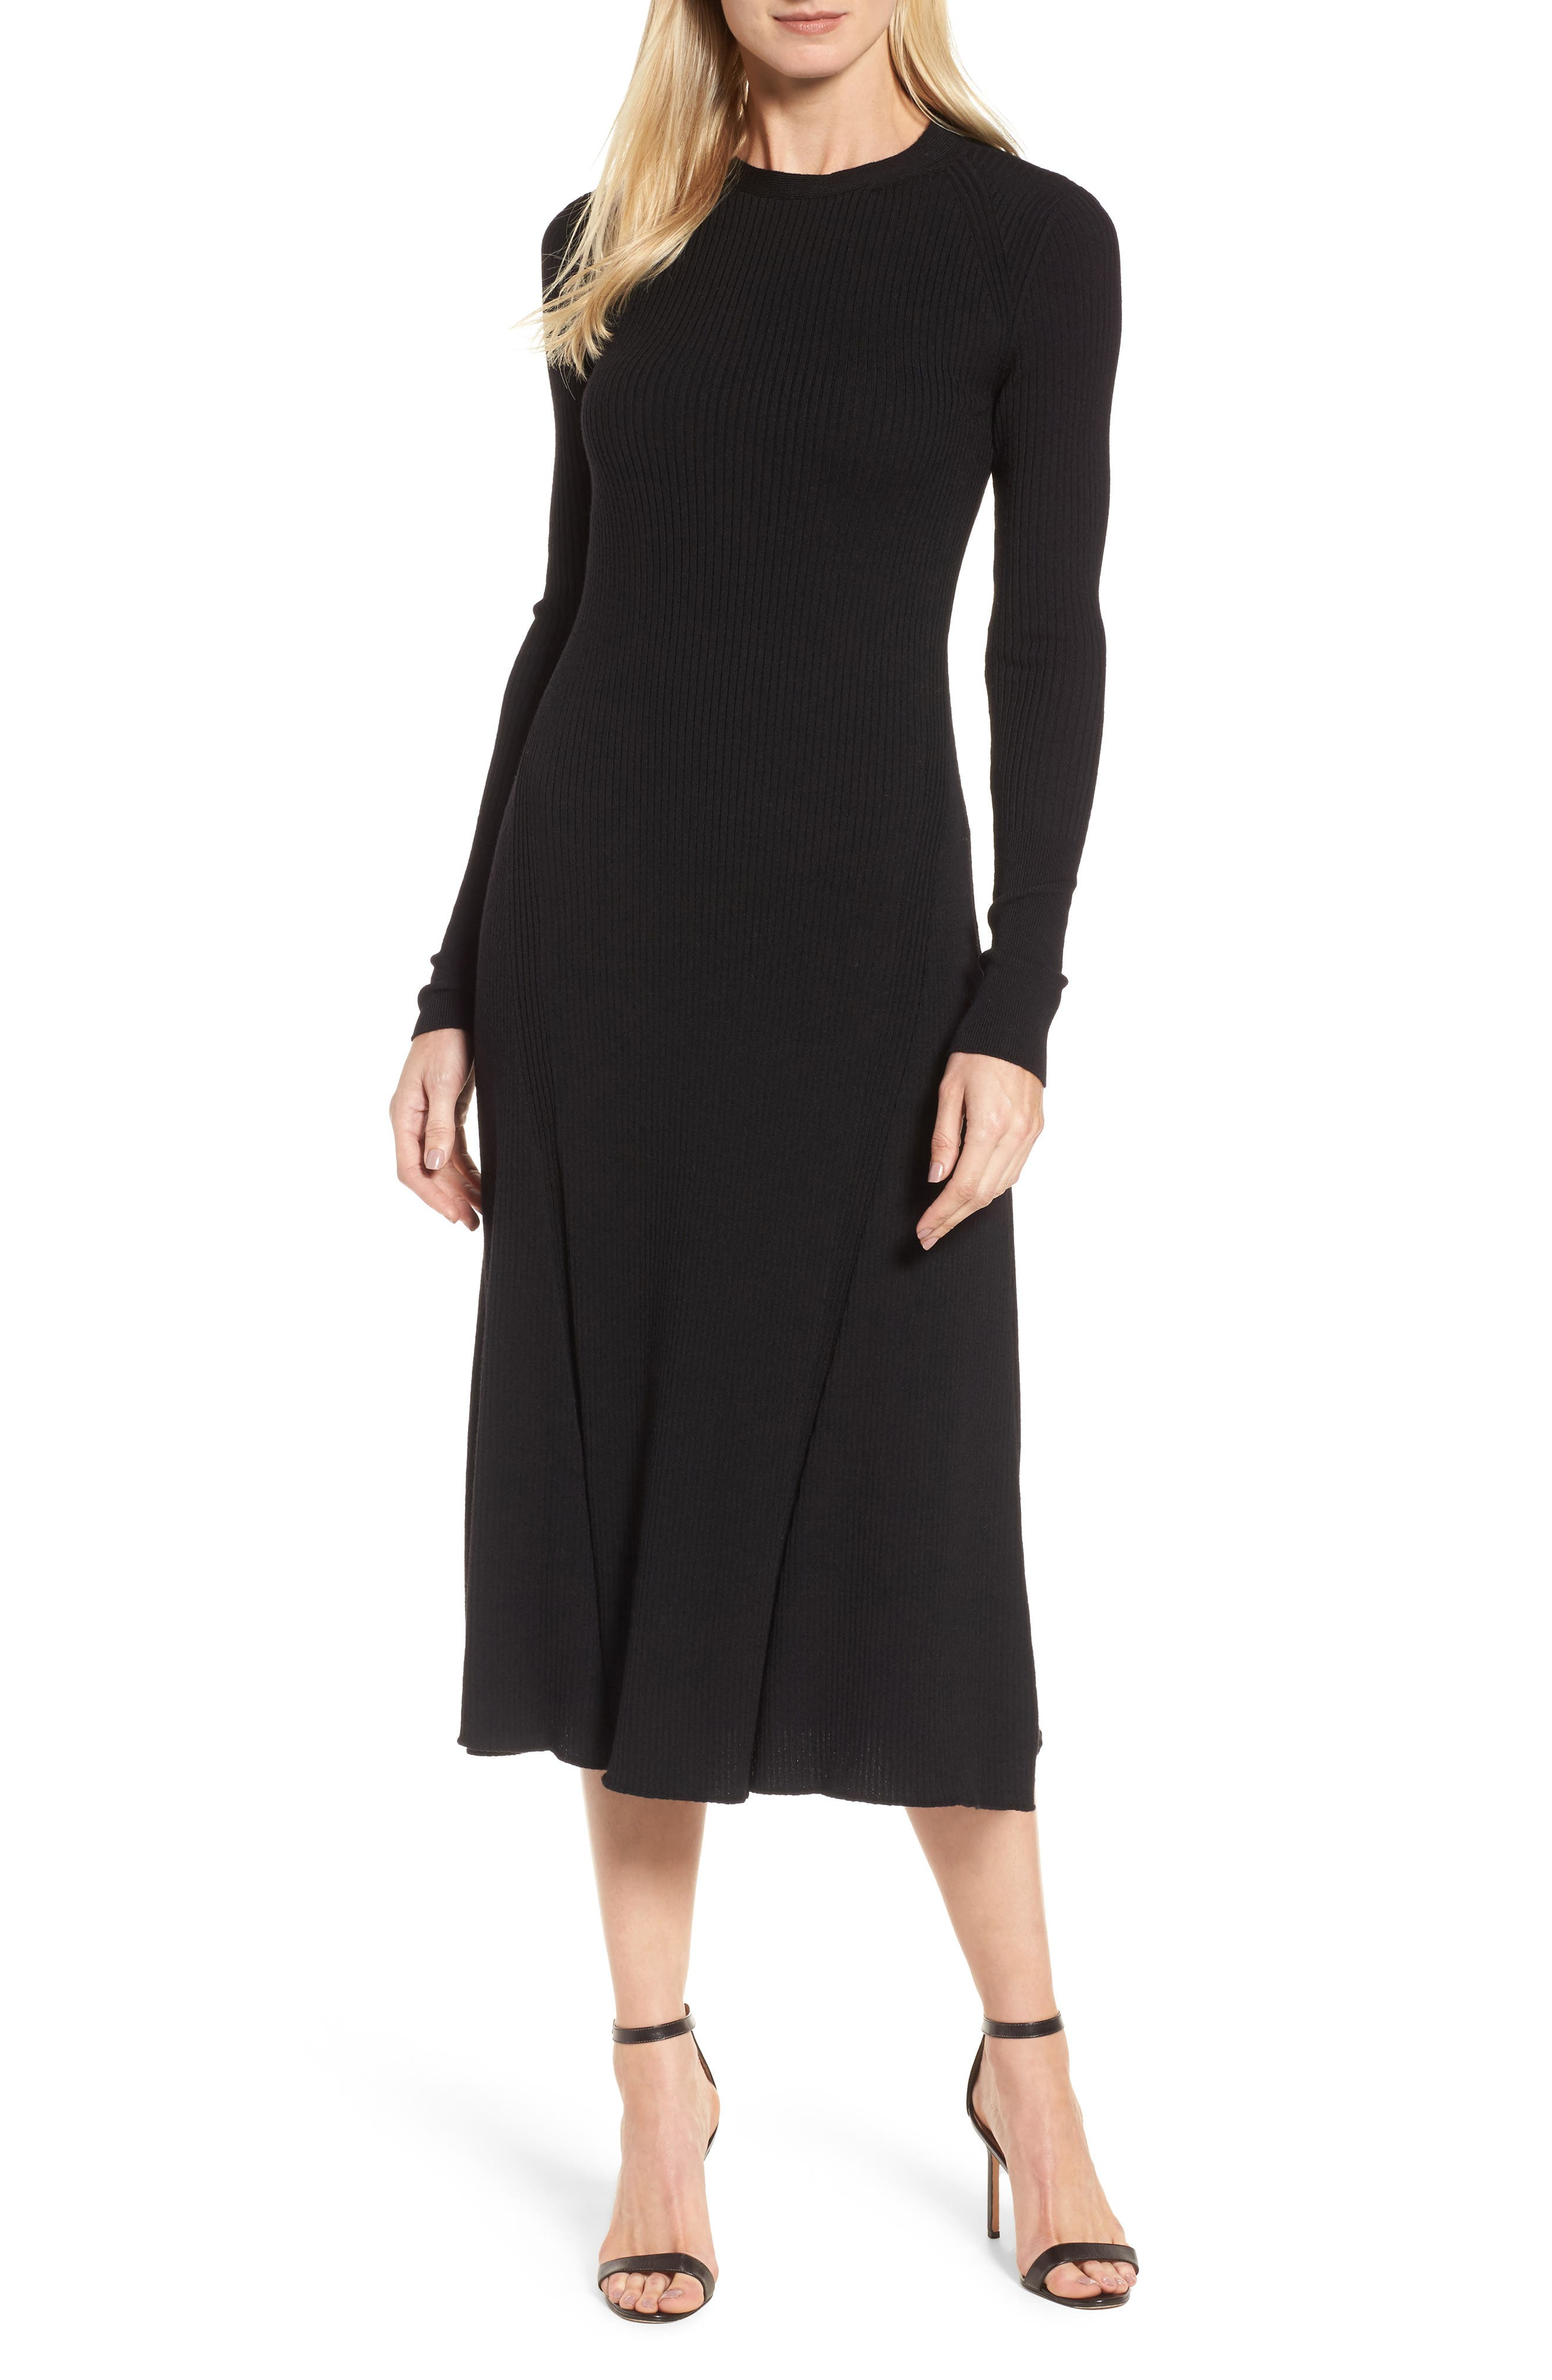 Faustine Midi Dress,                         Main,                         color, Black